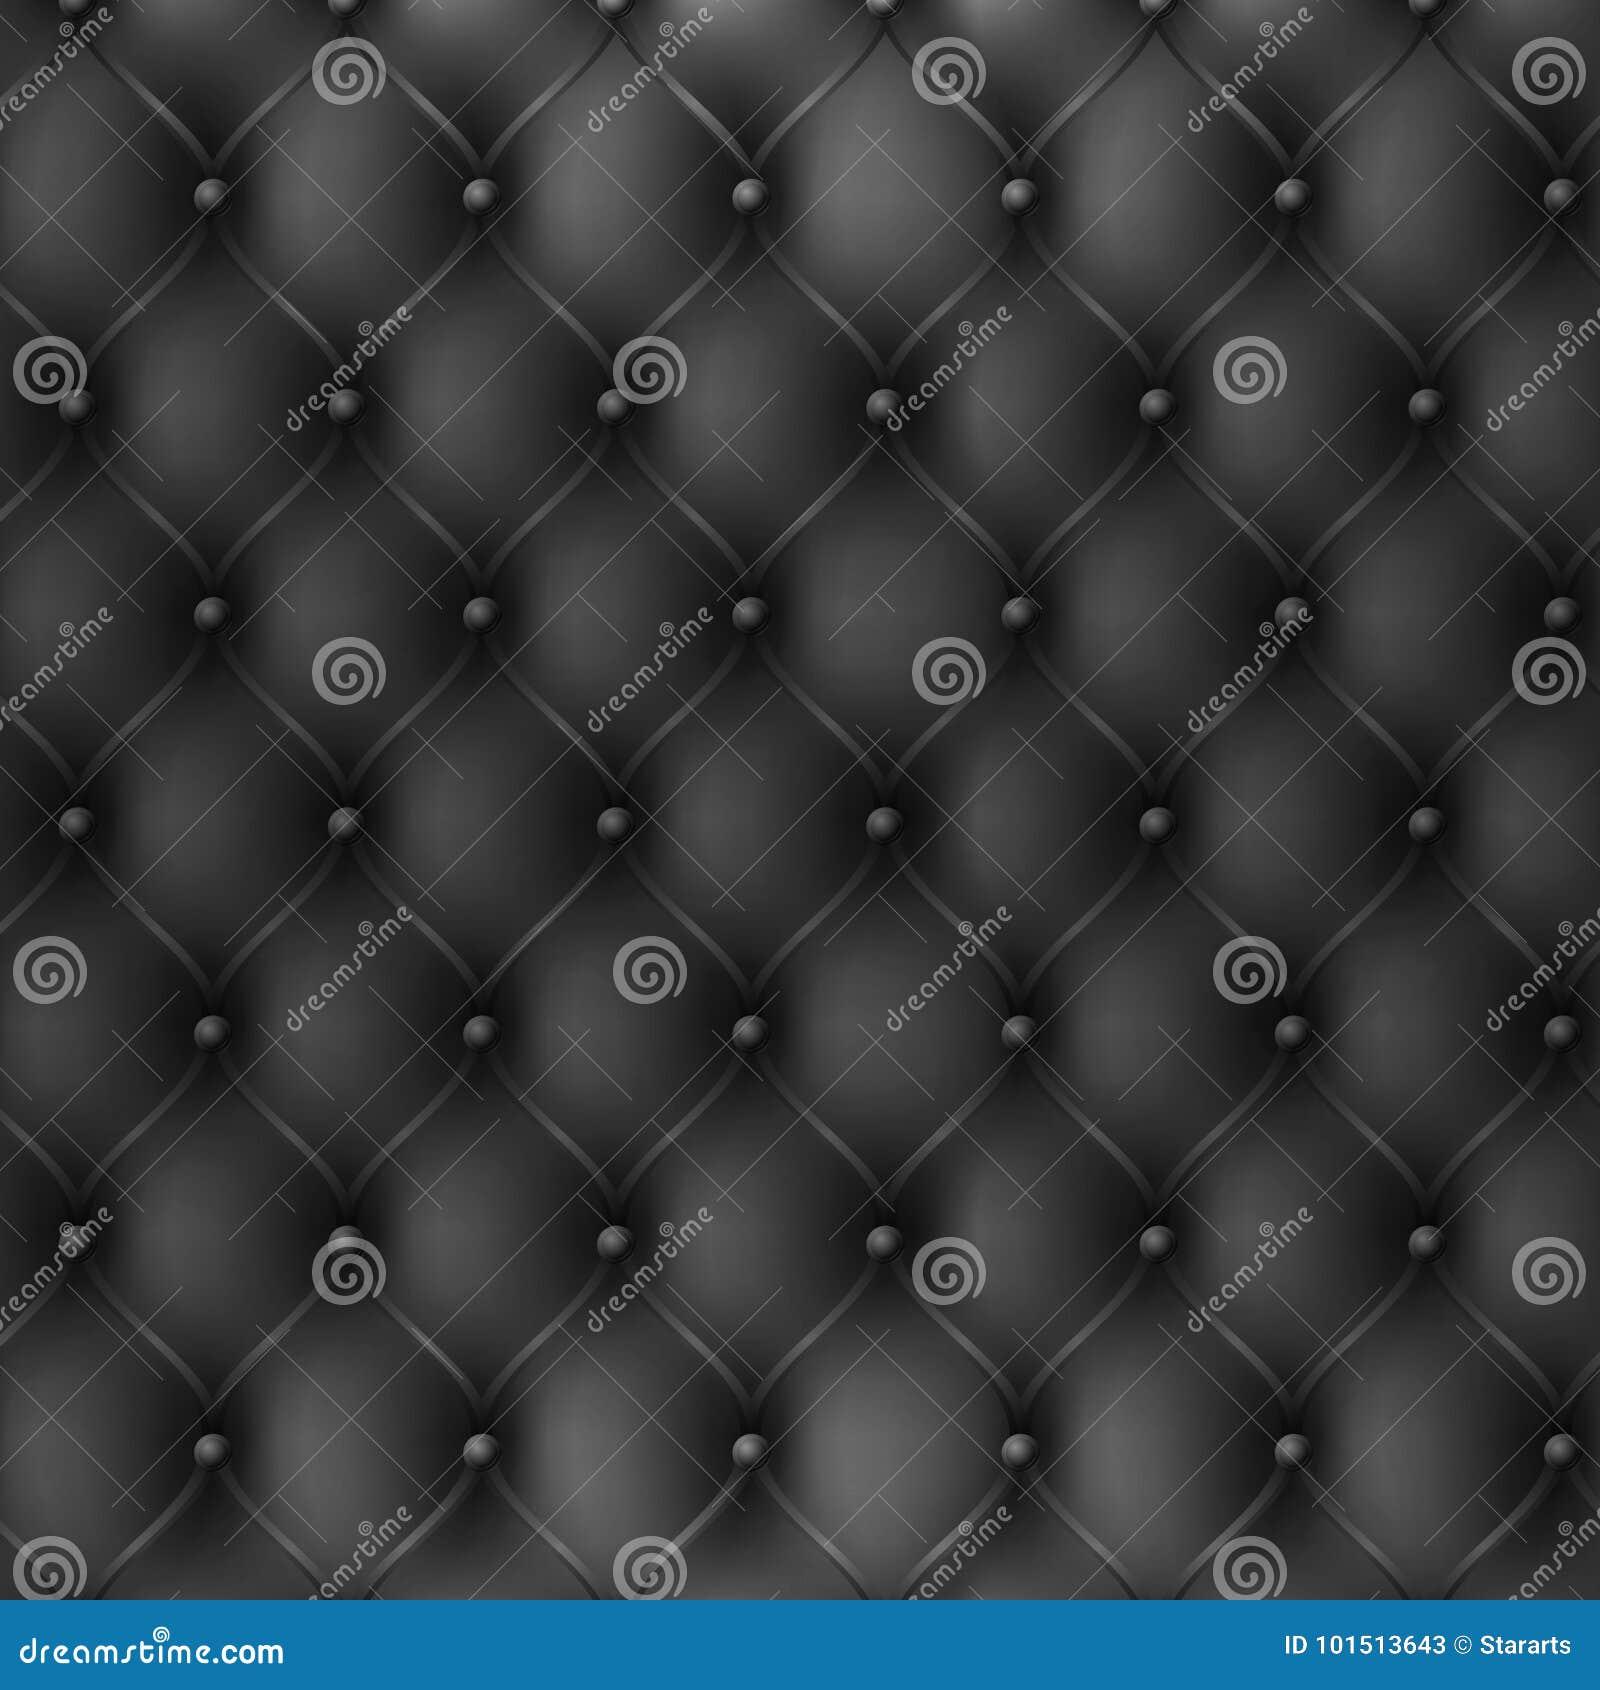 Premium dark fabric texture background